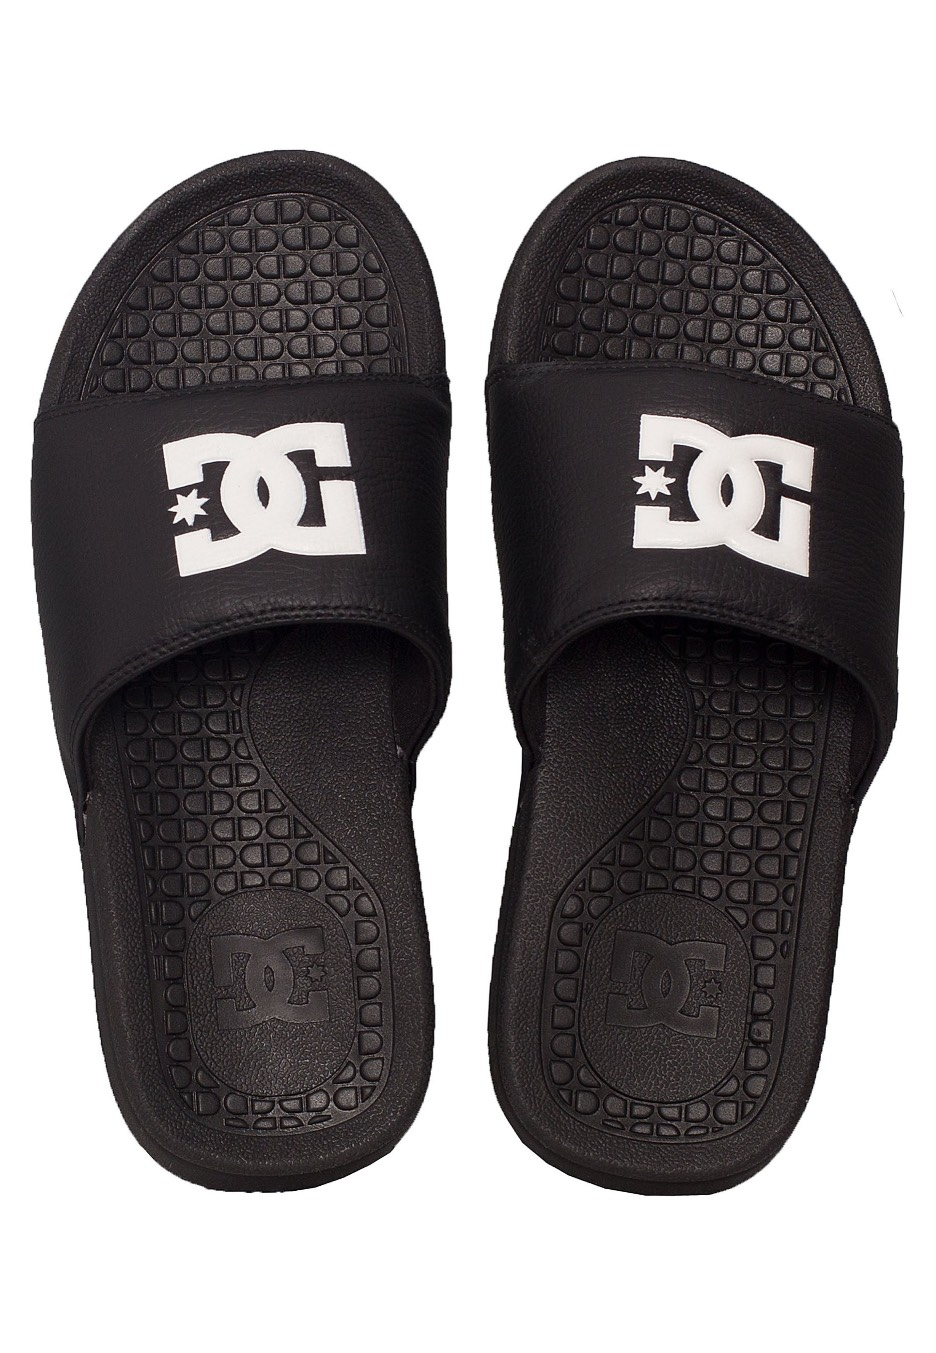 27519d945edd04 DC - Bolsa Black - Sandals - Impericon.com Worldwide